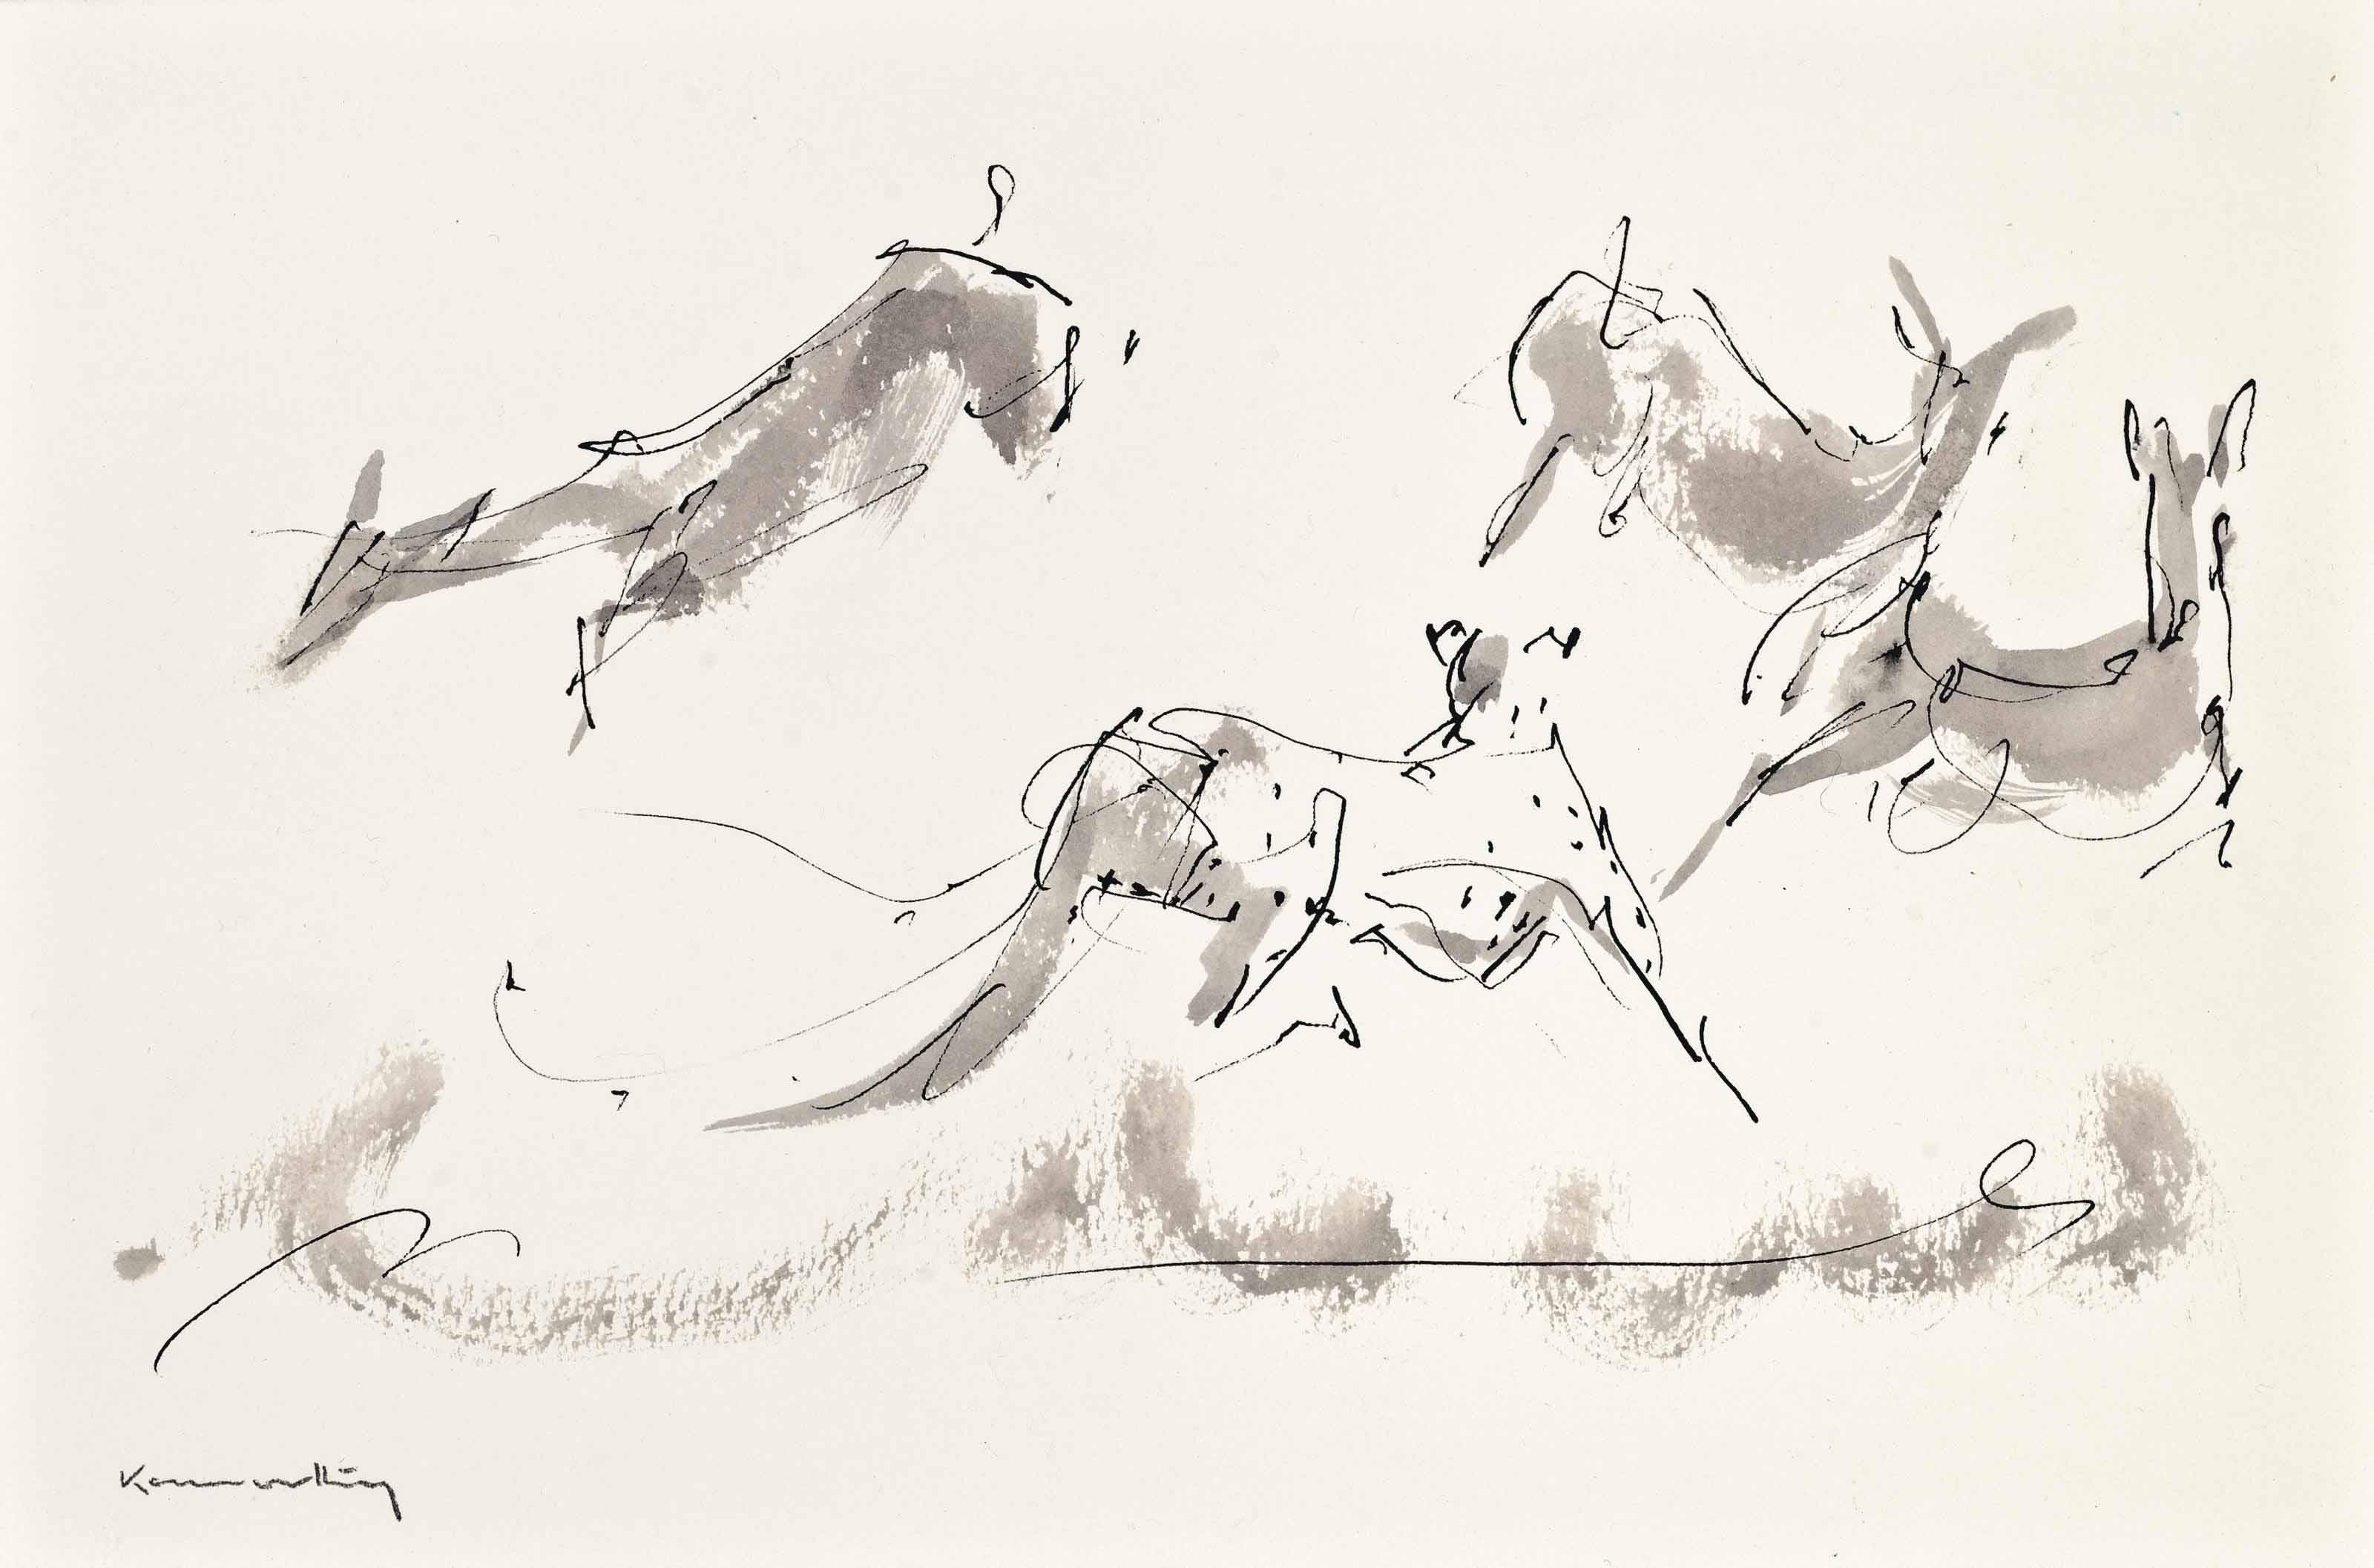 Cheetah chasing Gazelles